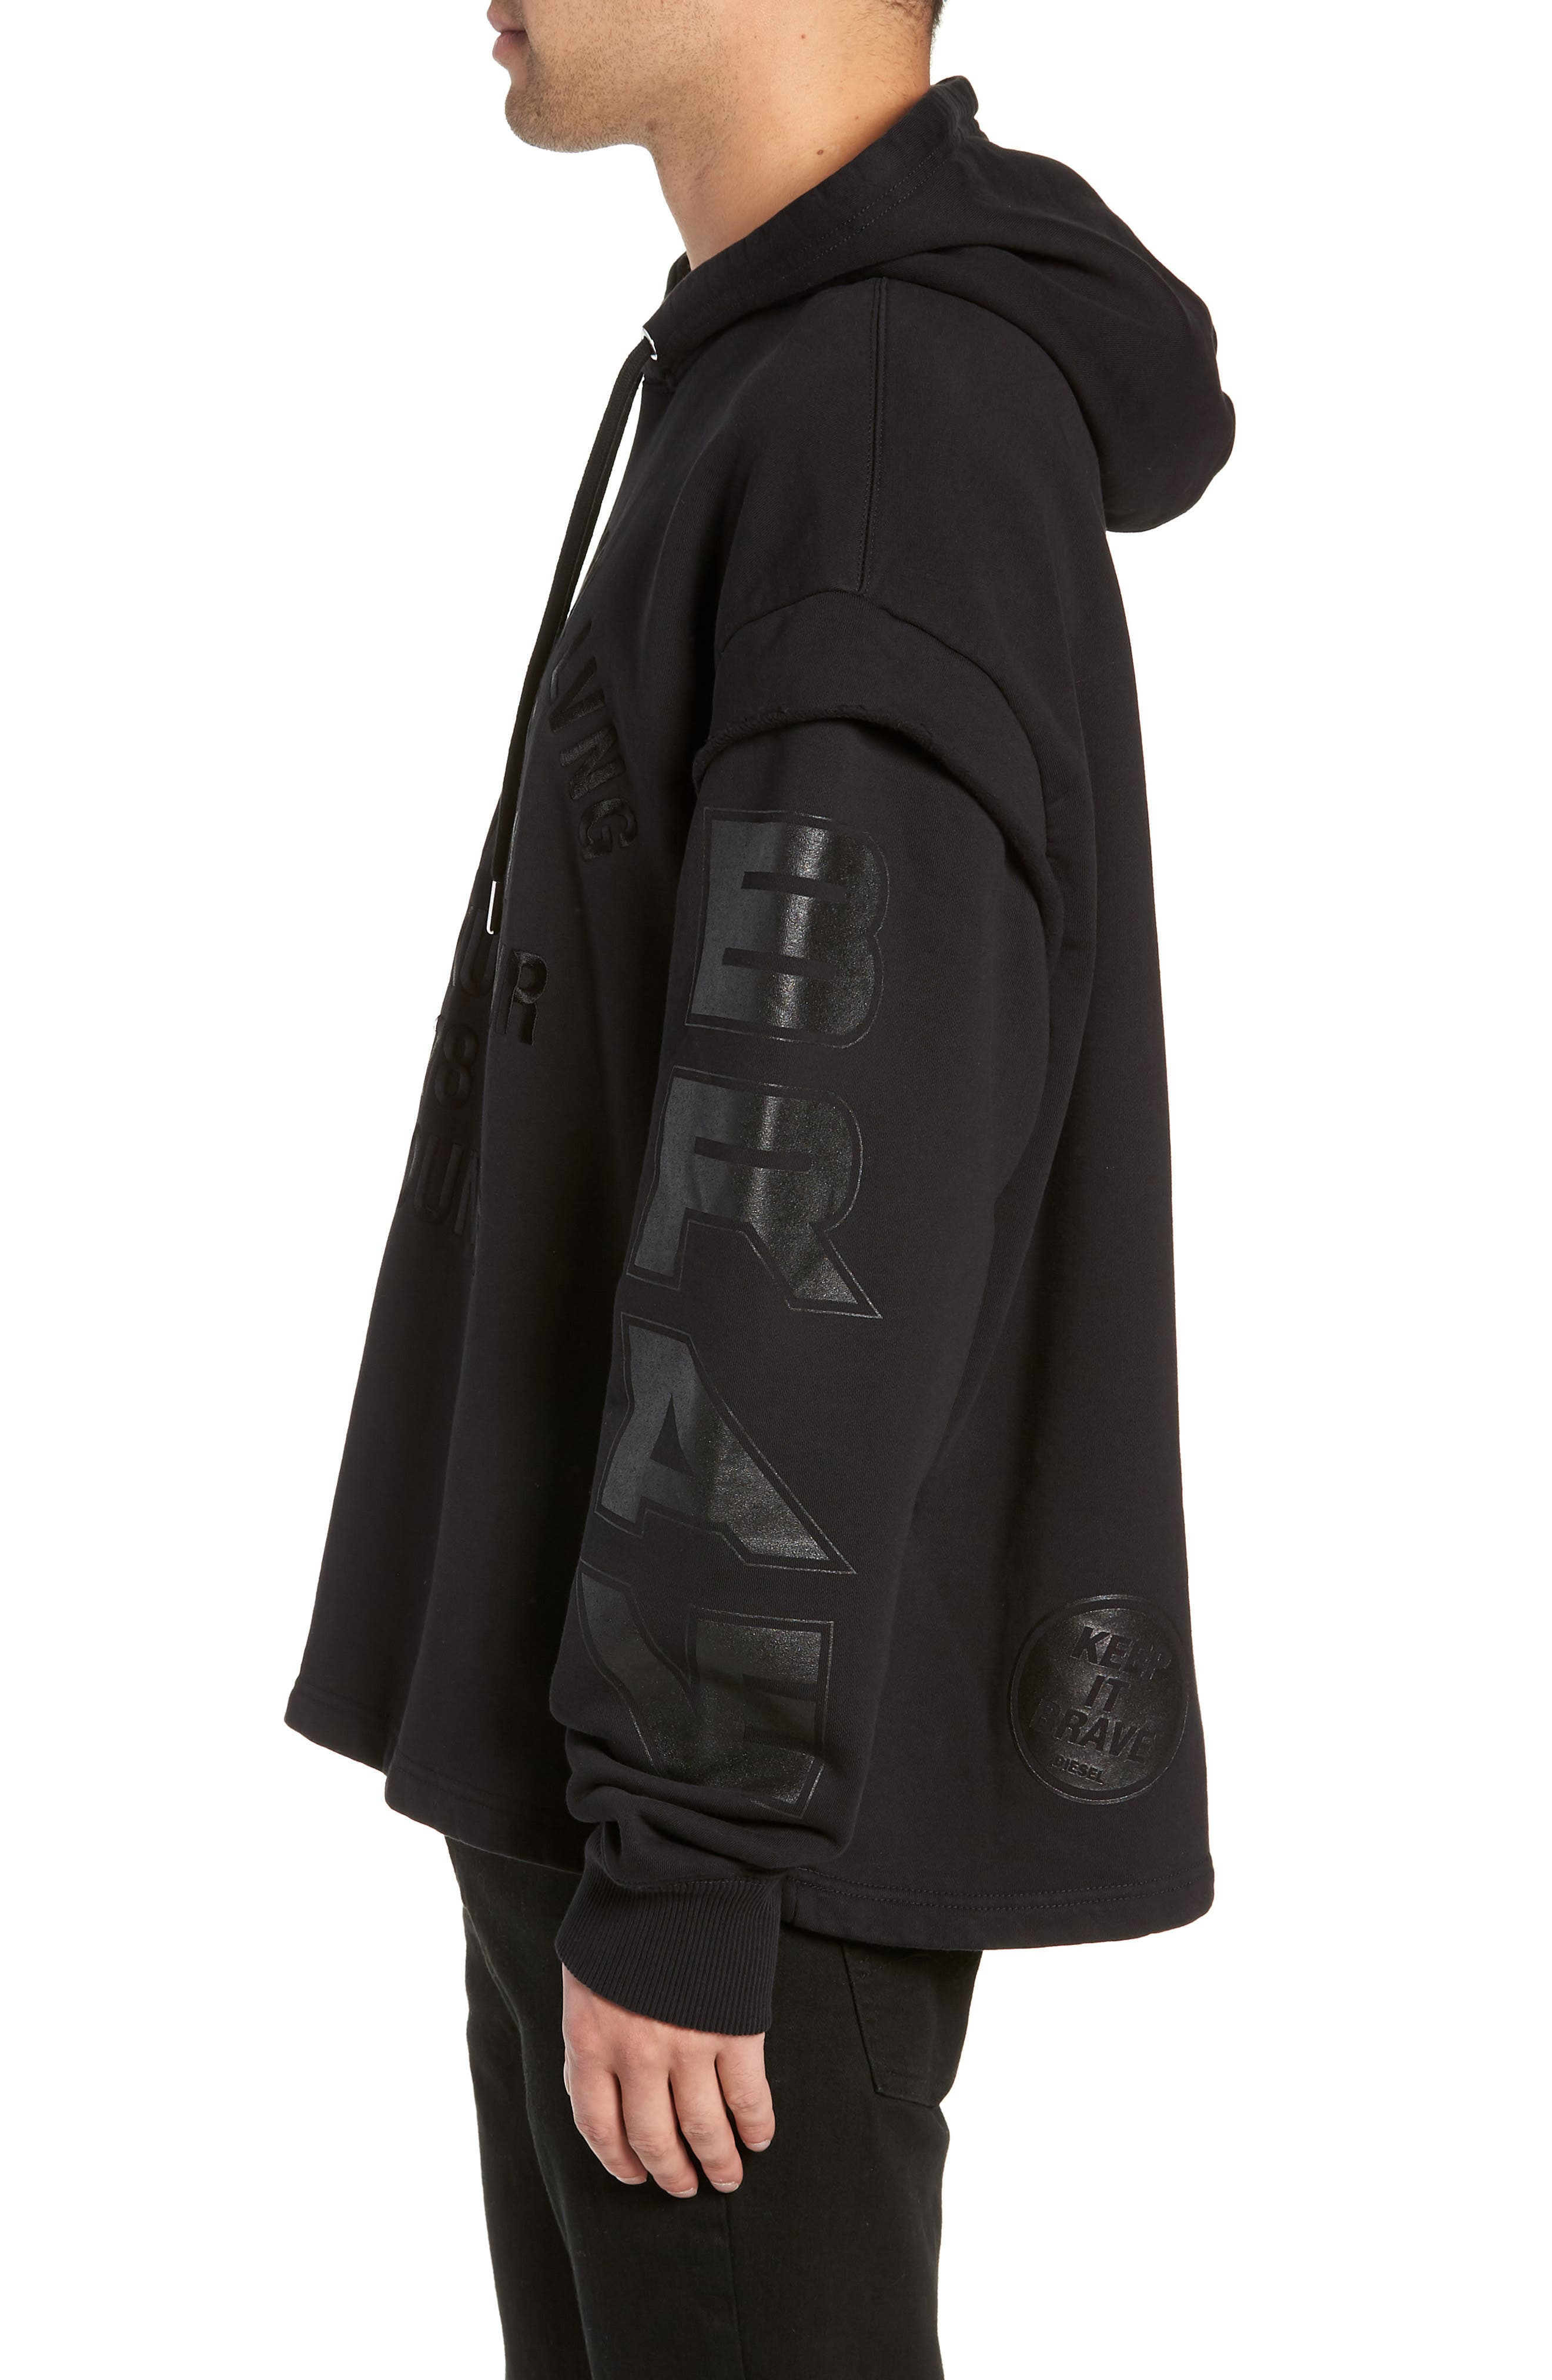 S-DRIVE-LS-XA Embroidered Hooded Sweatshirt,                             Alternate thumbnail 4, color,                             BLACK